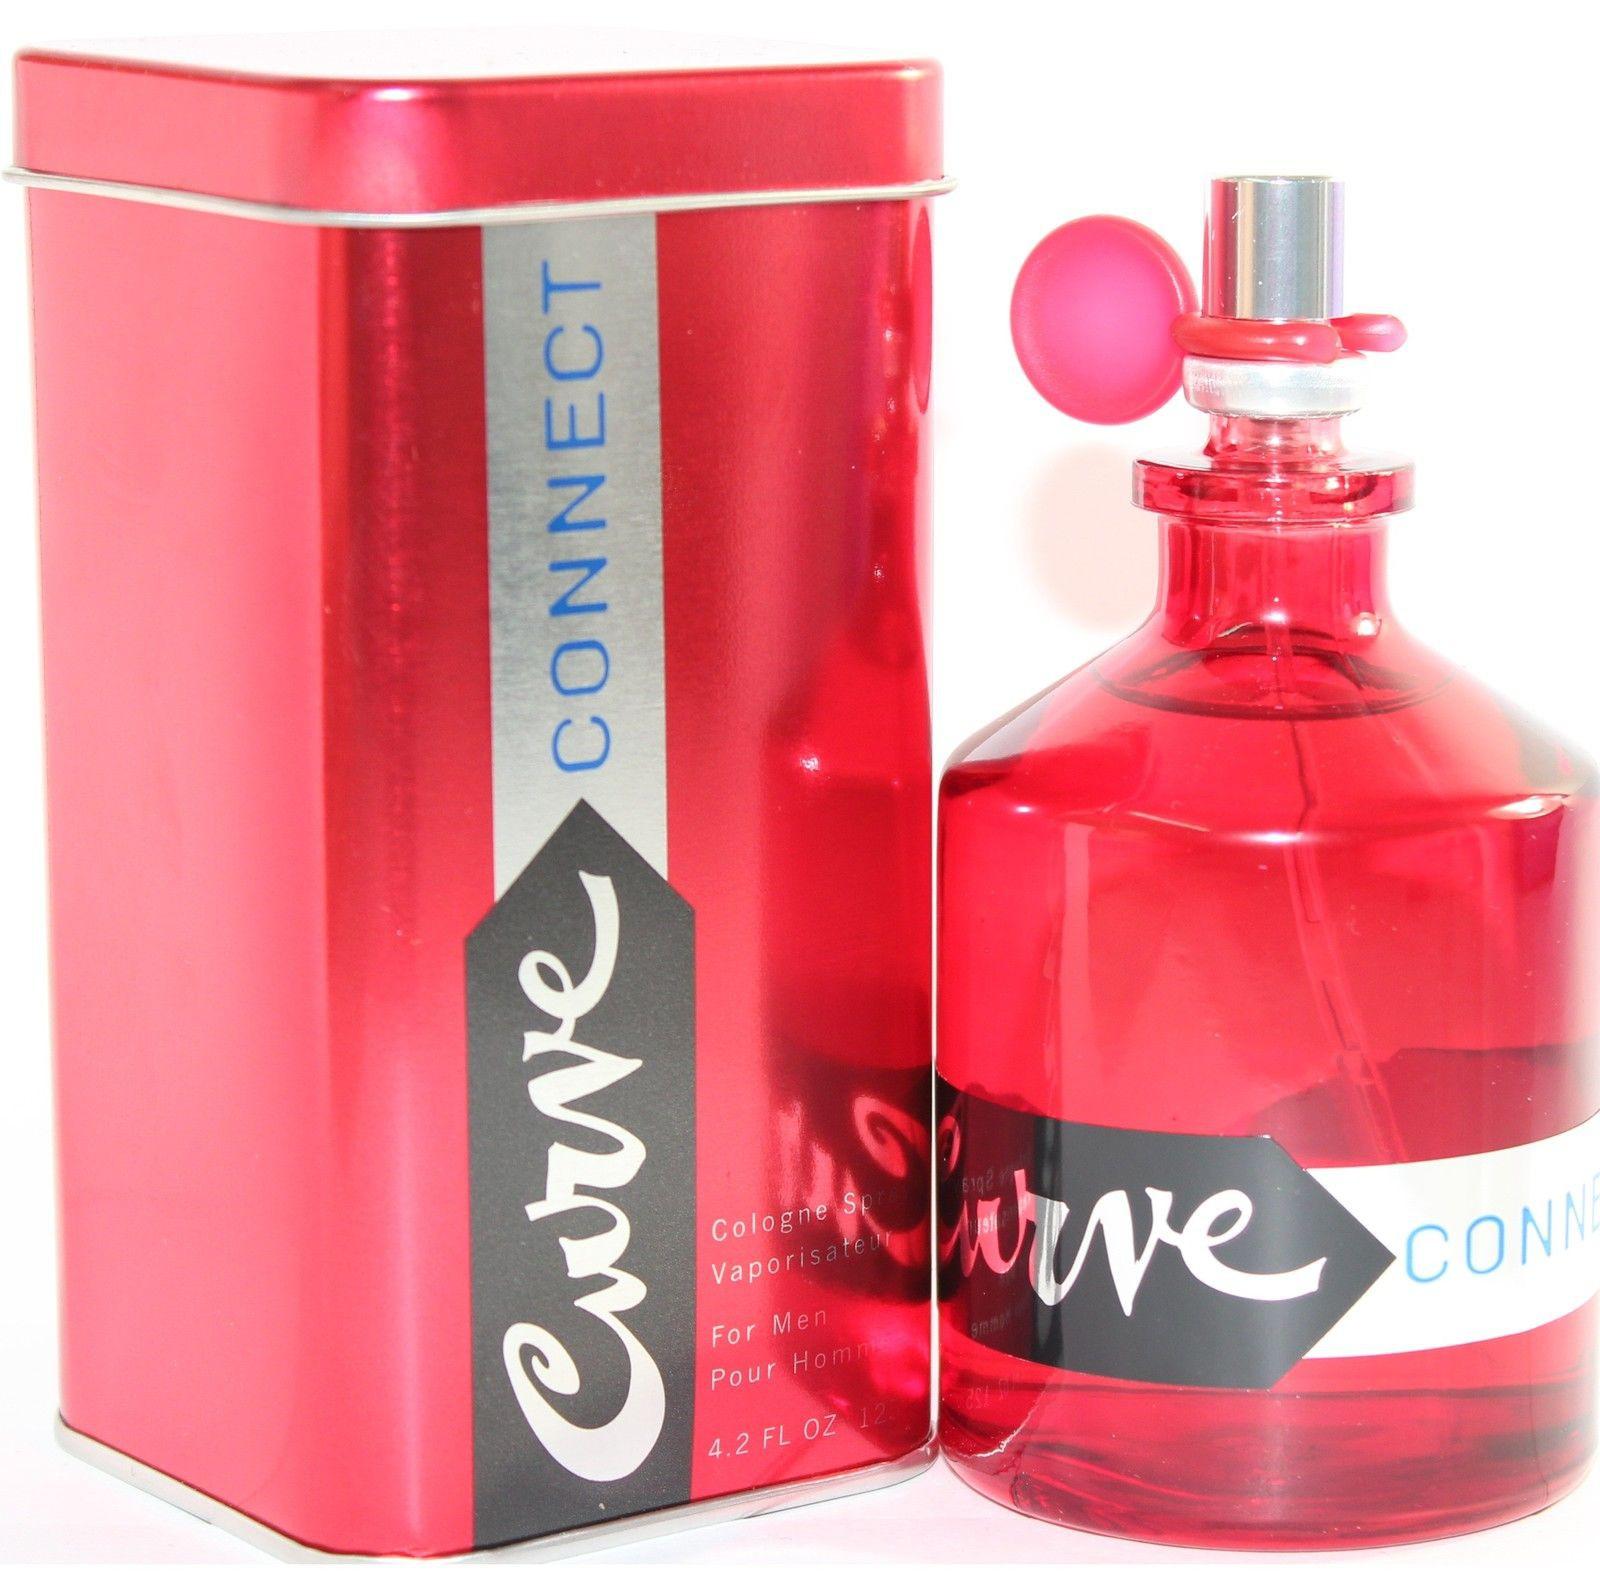 Liz Claiborne Curve Connect for Men аромат для мужчин